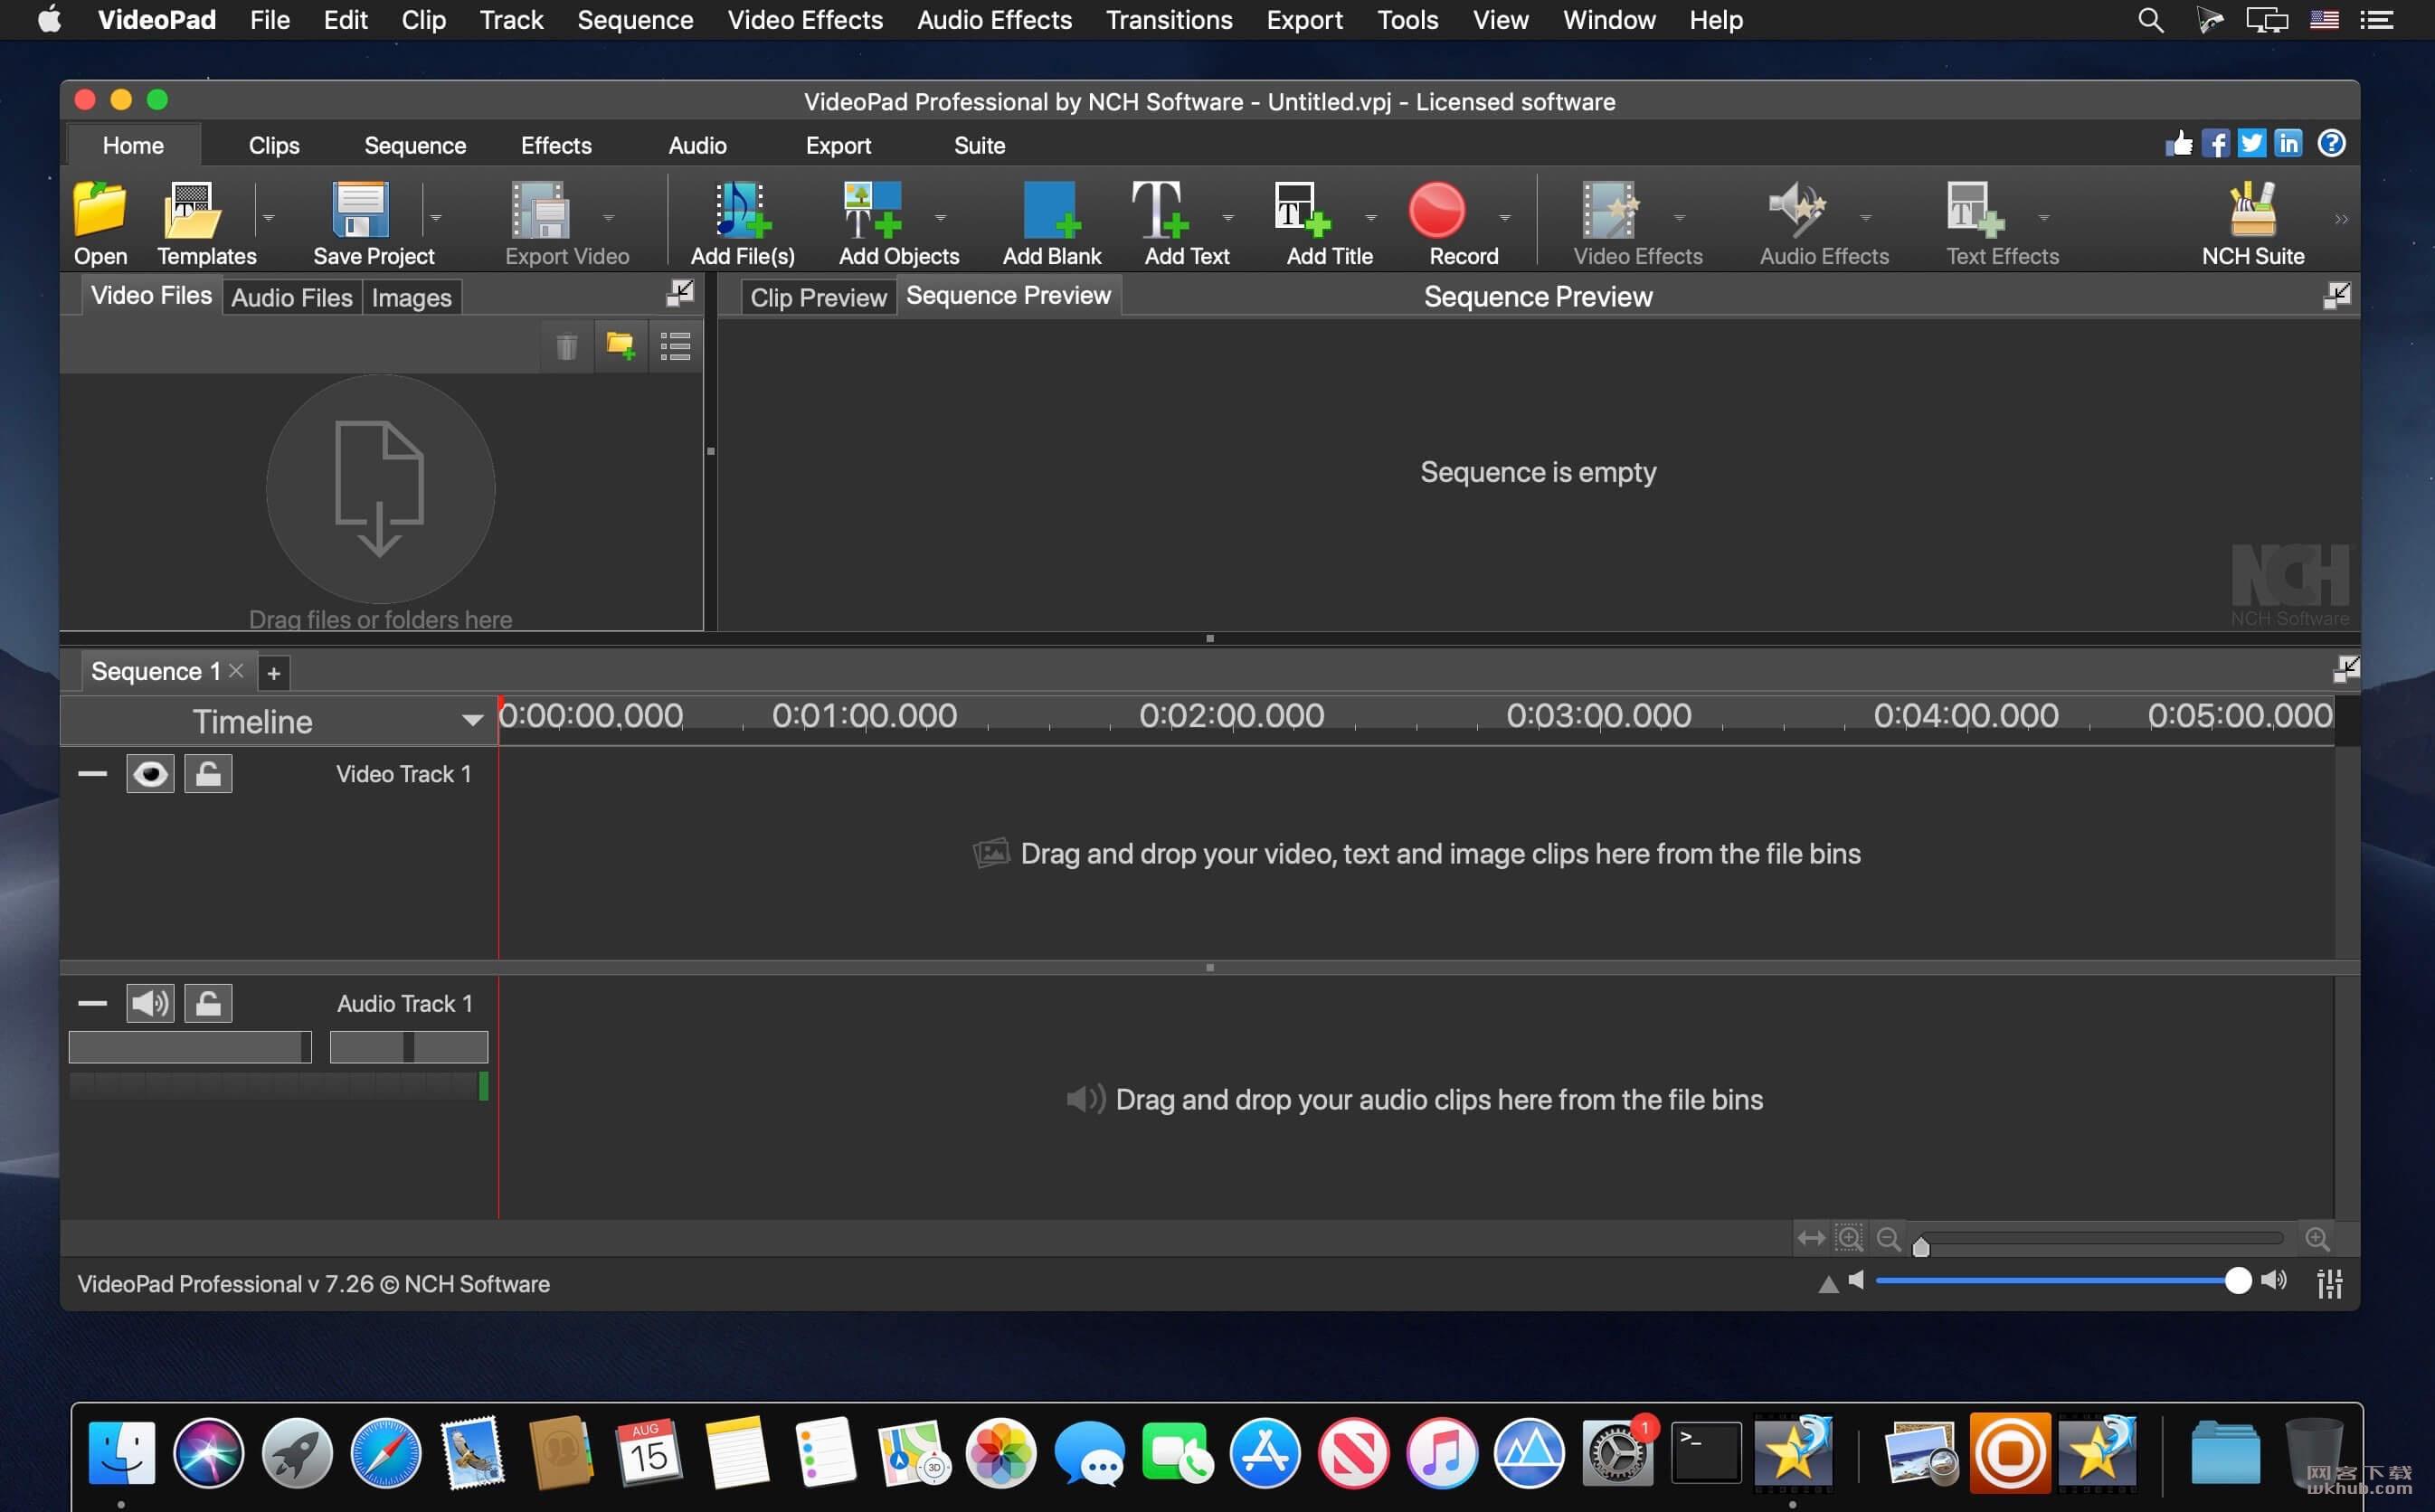 NCH VideoPad Pro 7.26 视频编辑工具